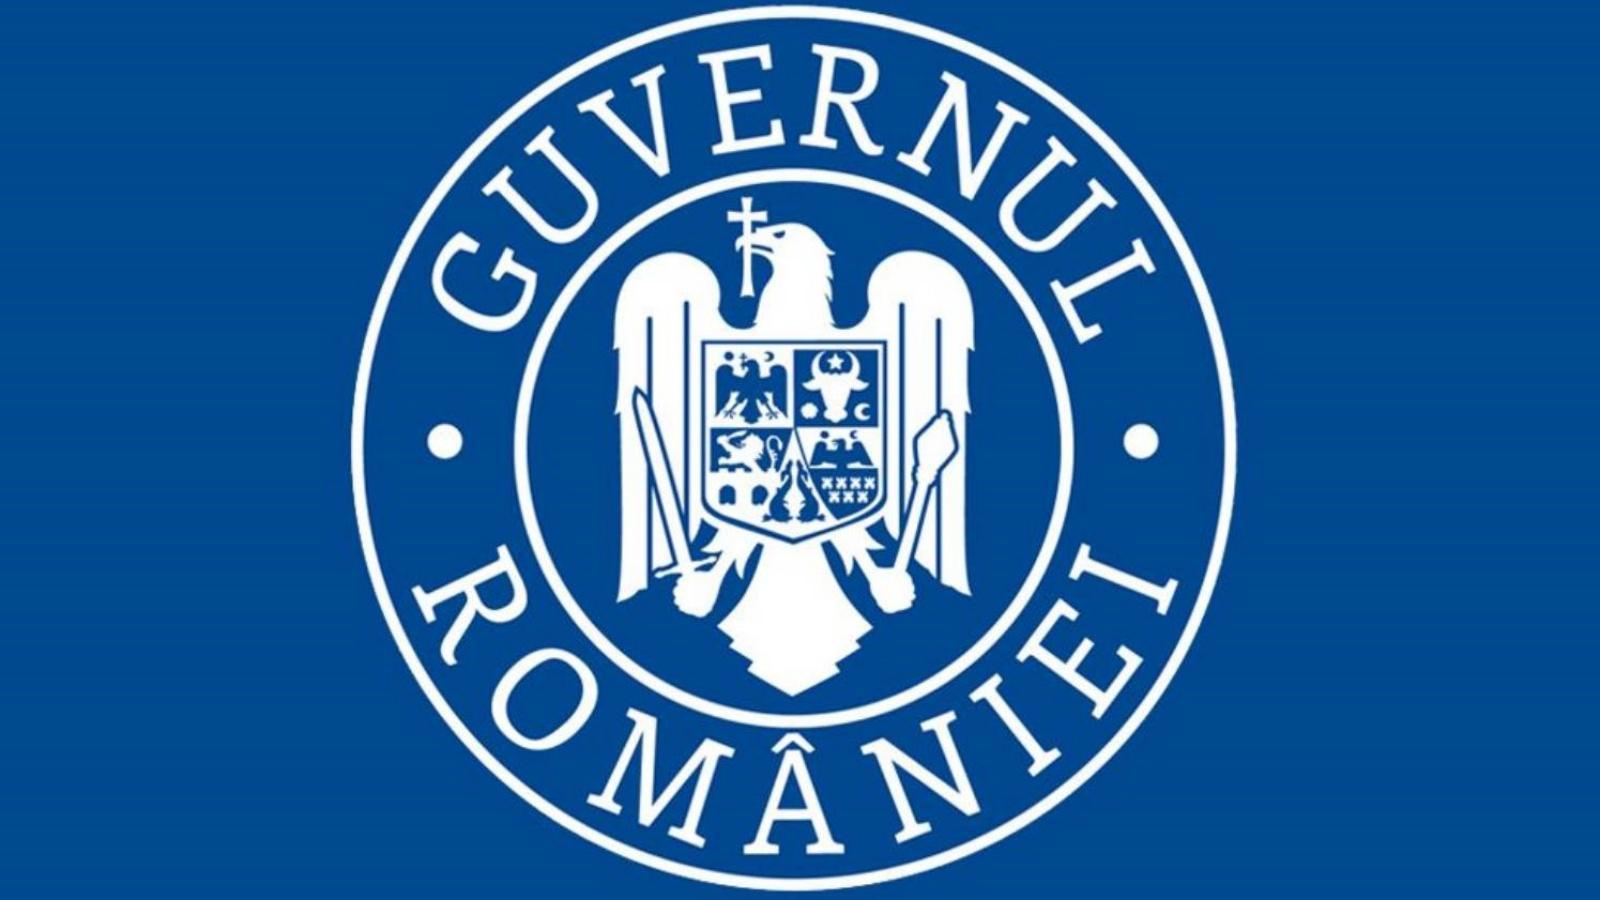 Guvernul Romaniei Pitesti Raspandire Comunitare Variantei Delta Coronavirus